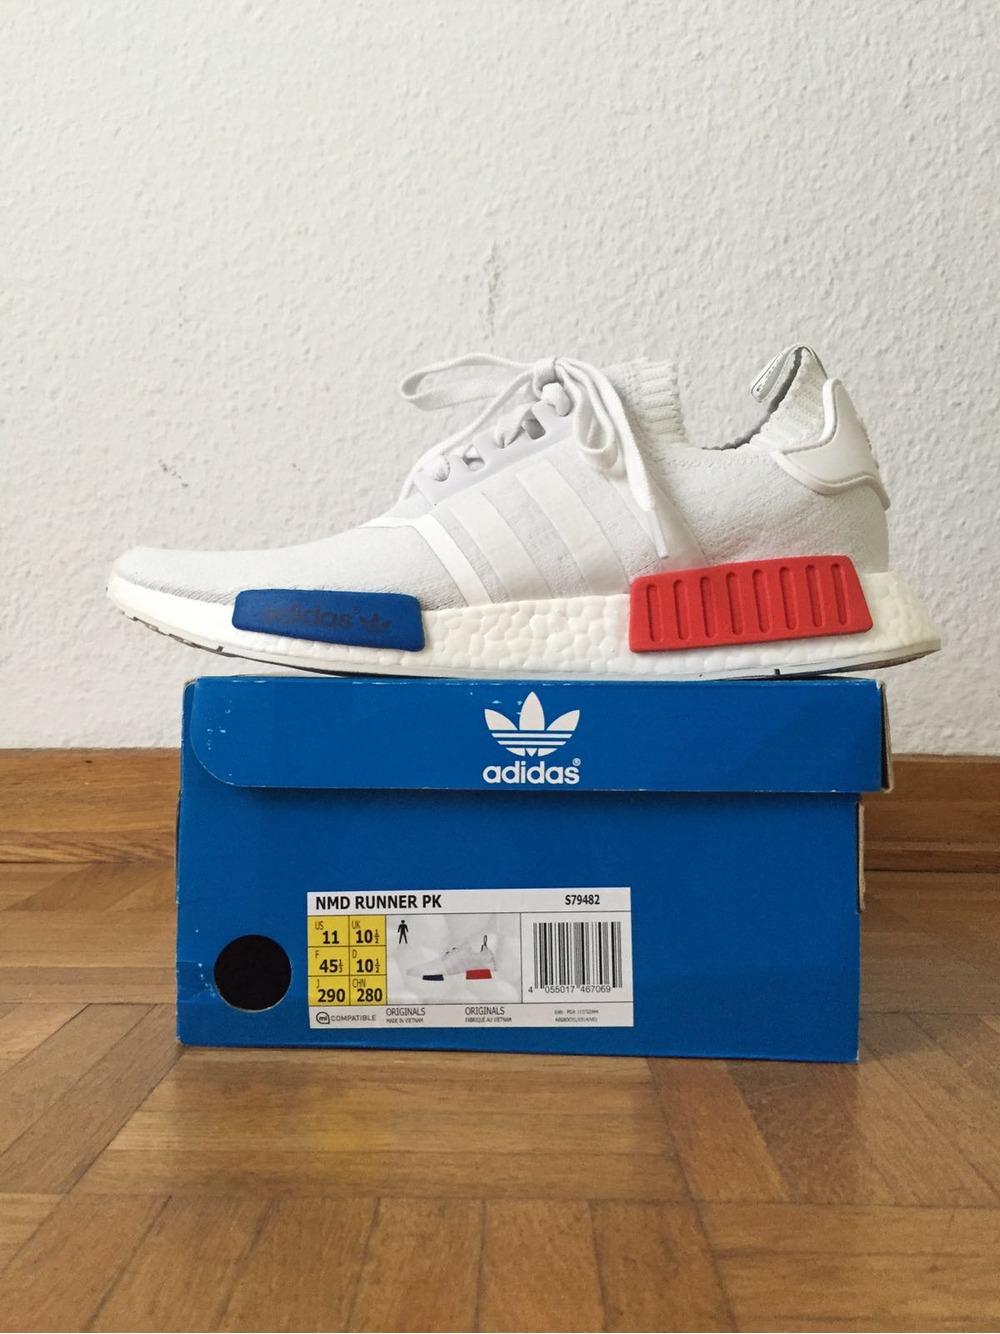 Nmd Adidas Box